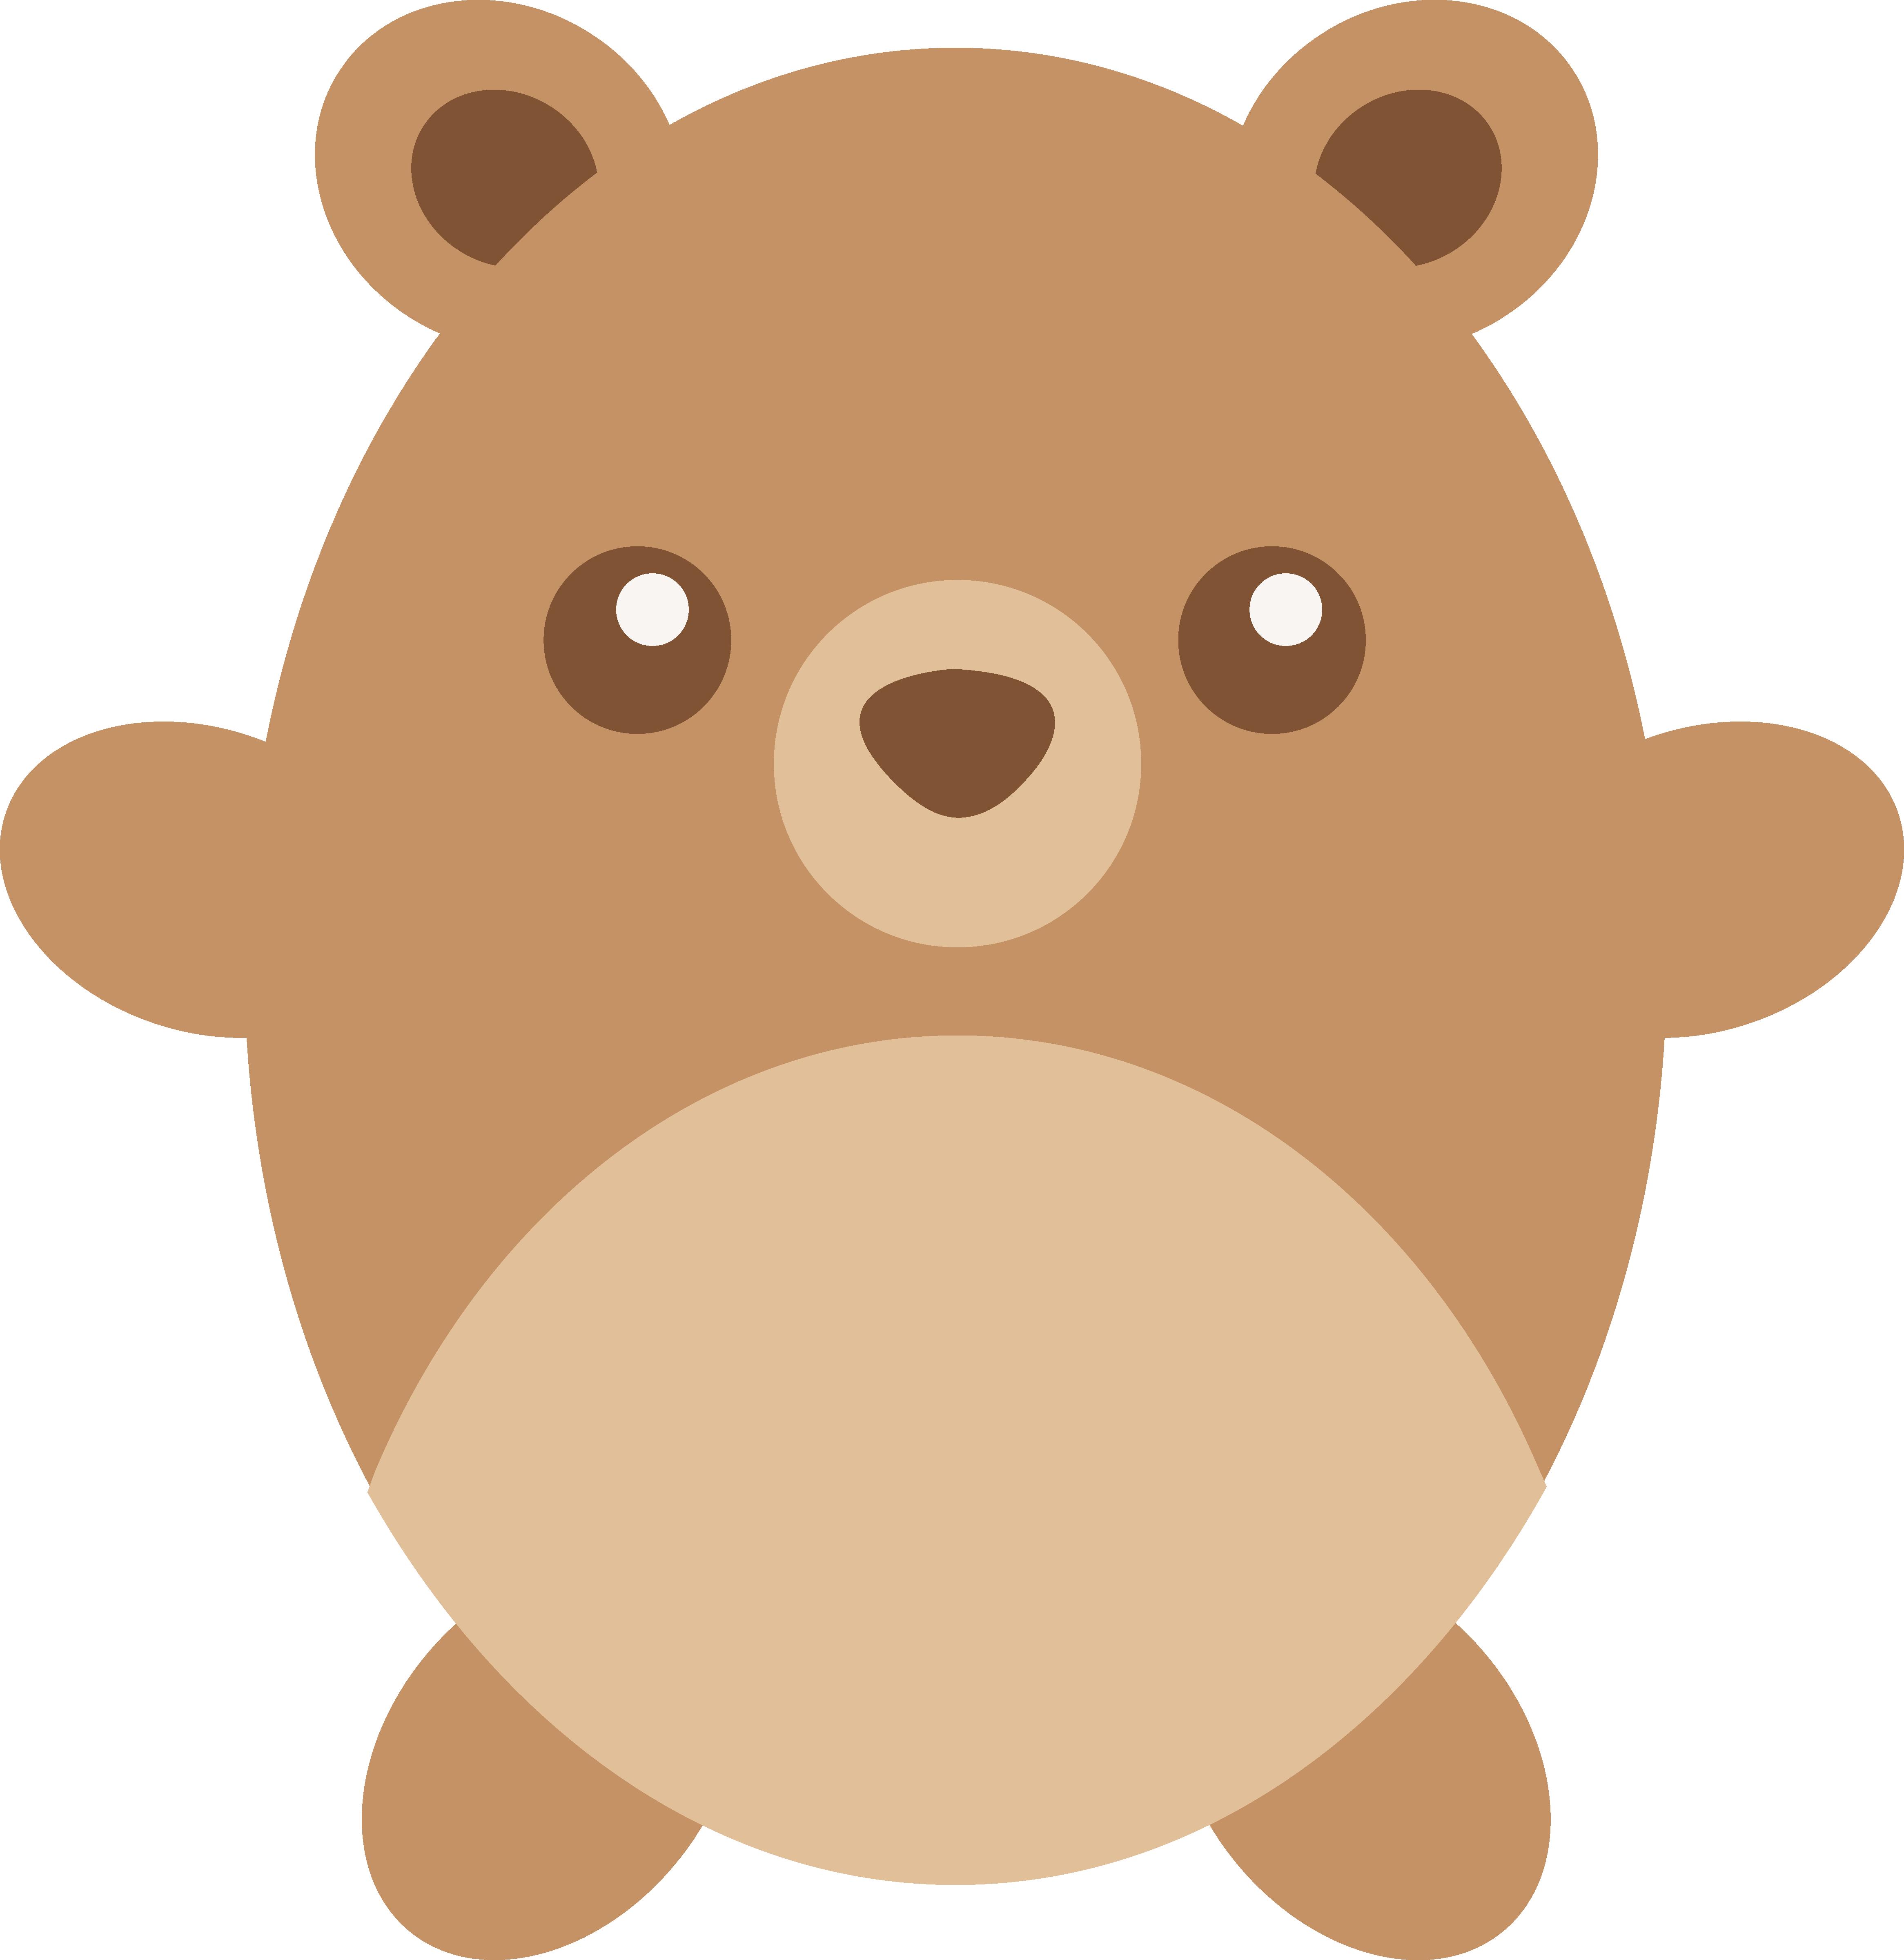 Paw clipart brown bear. Cute drawing at getdrawings